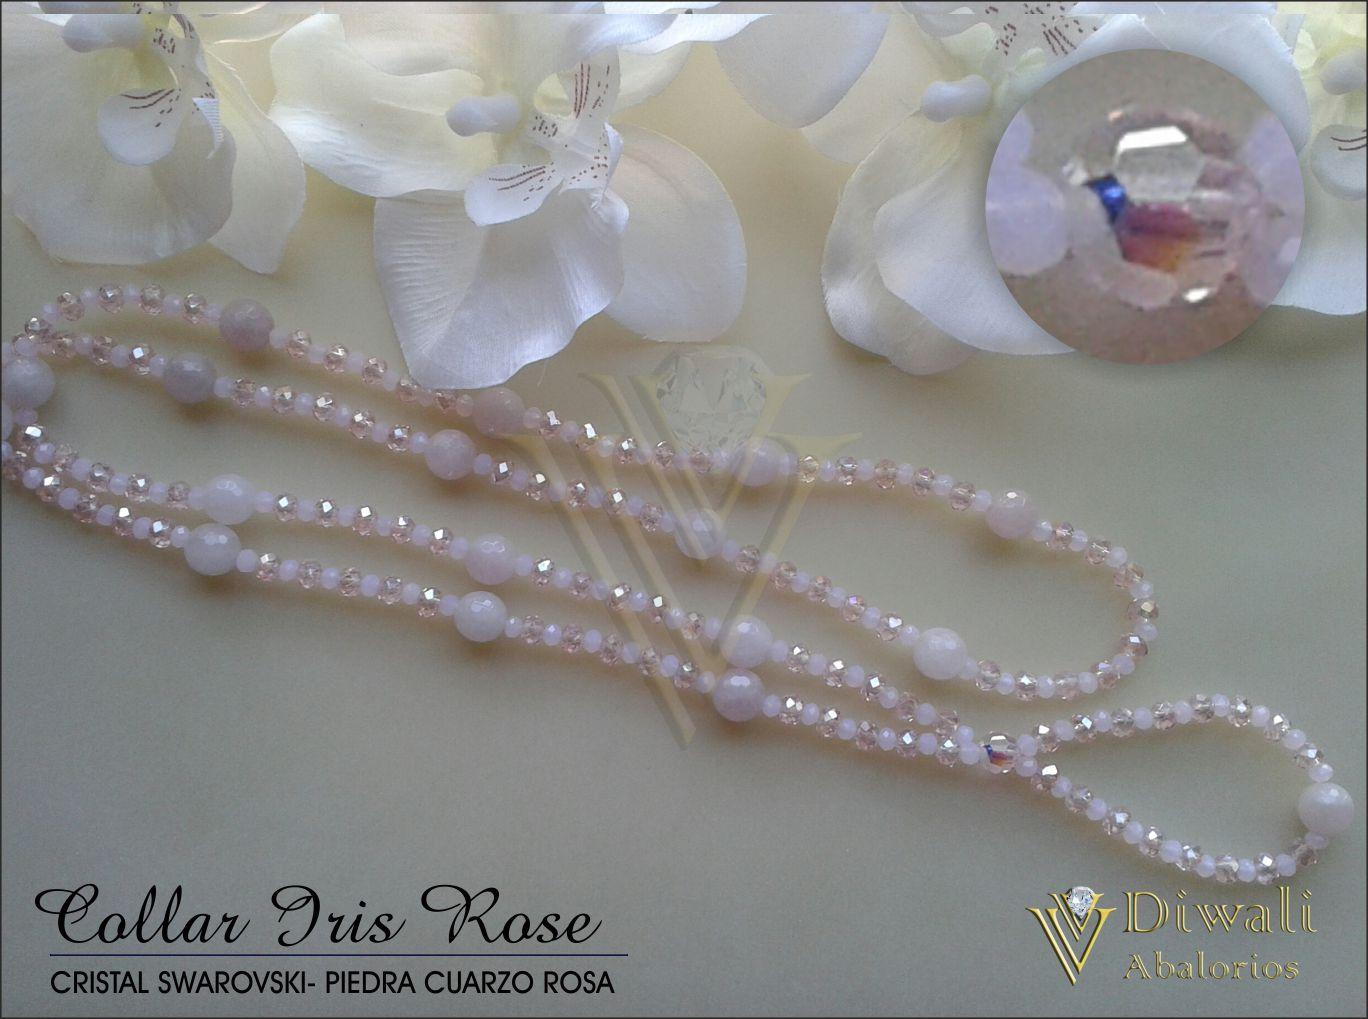 Collar Iris Rose